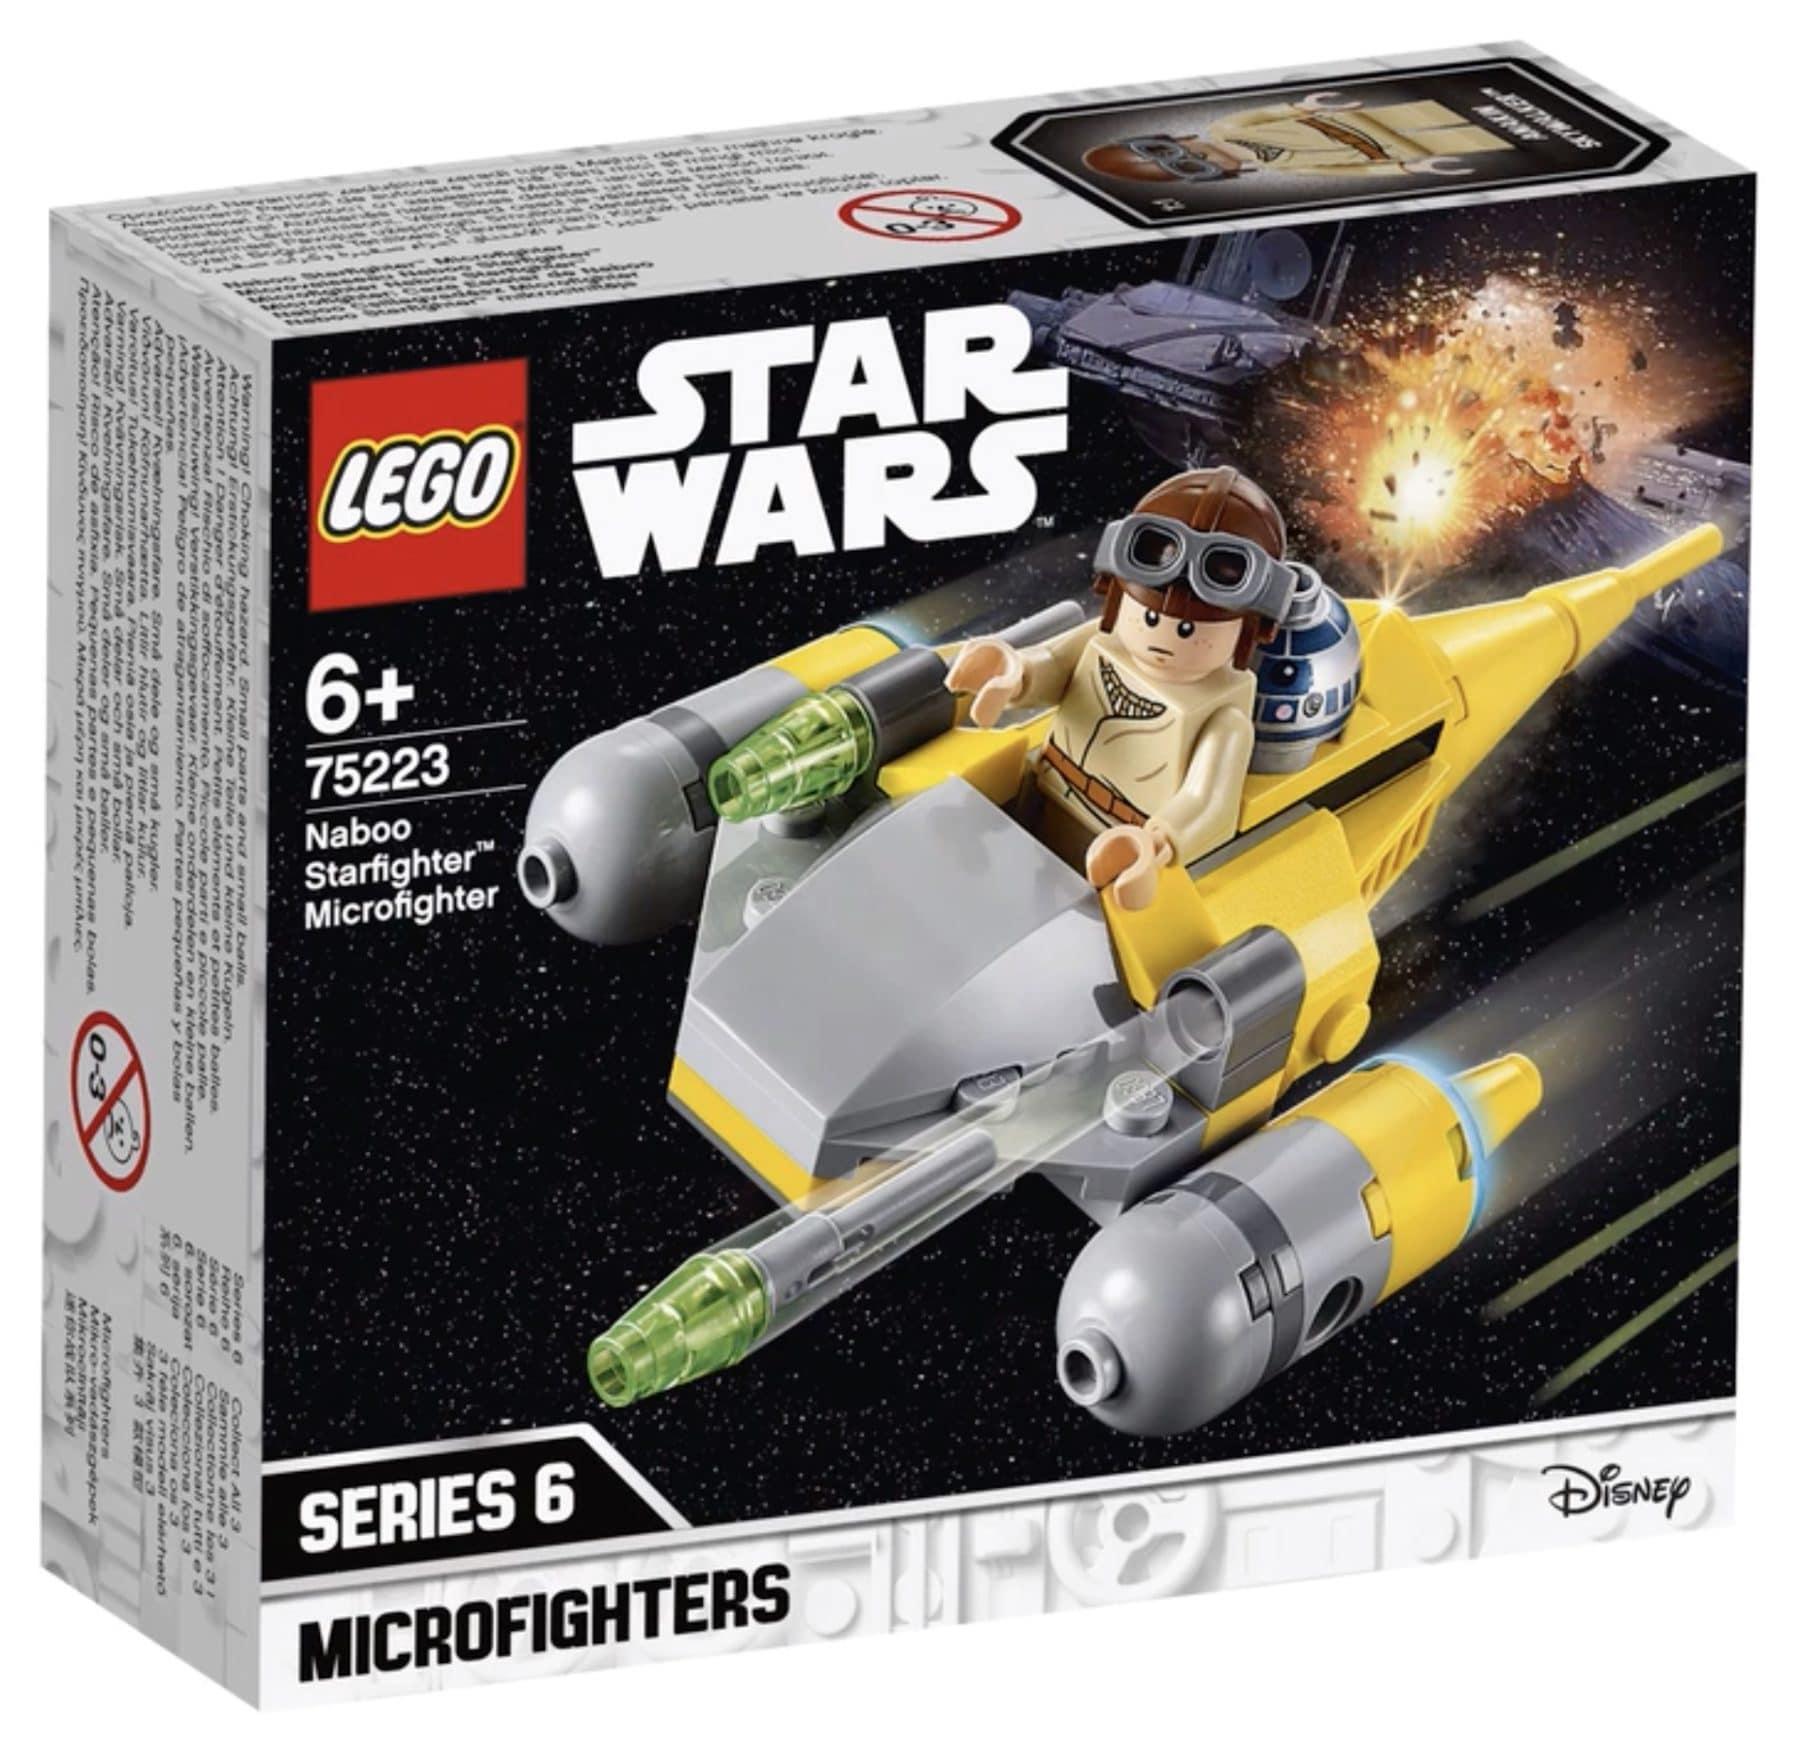 LEGO 75223 Naboo Starfighter Microfighter